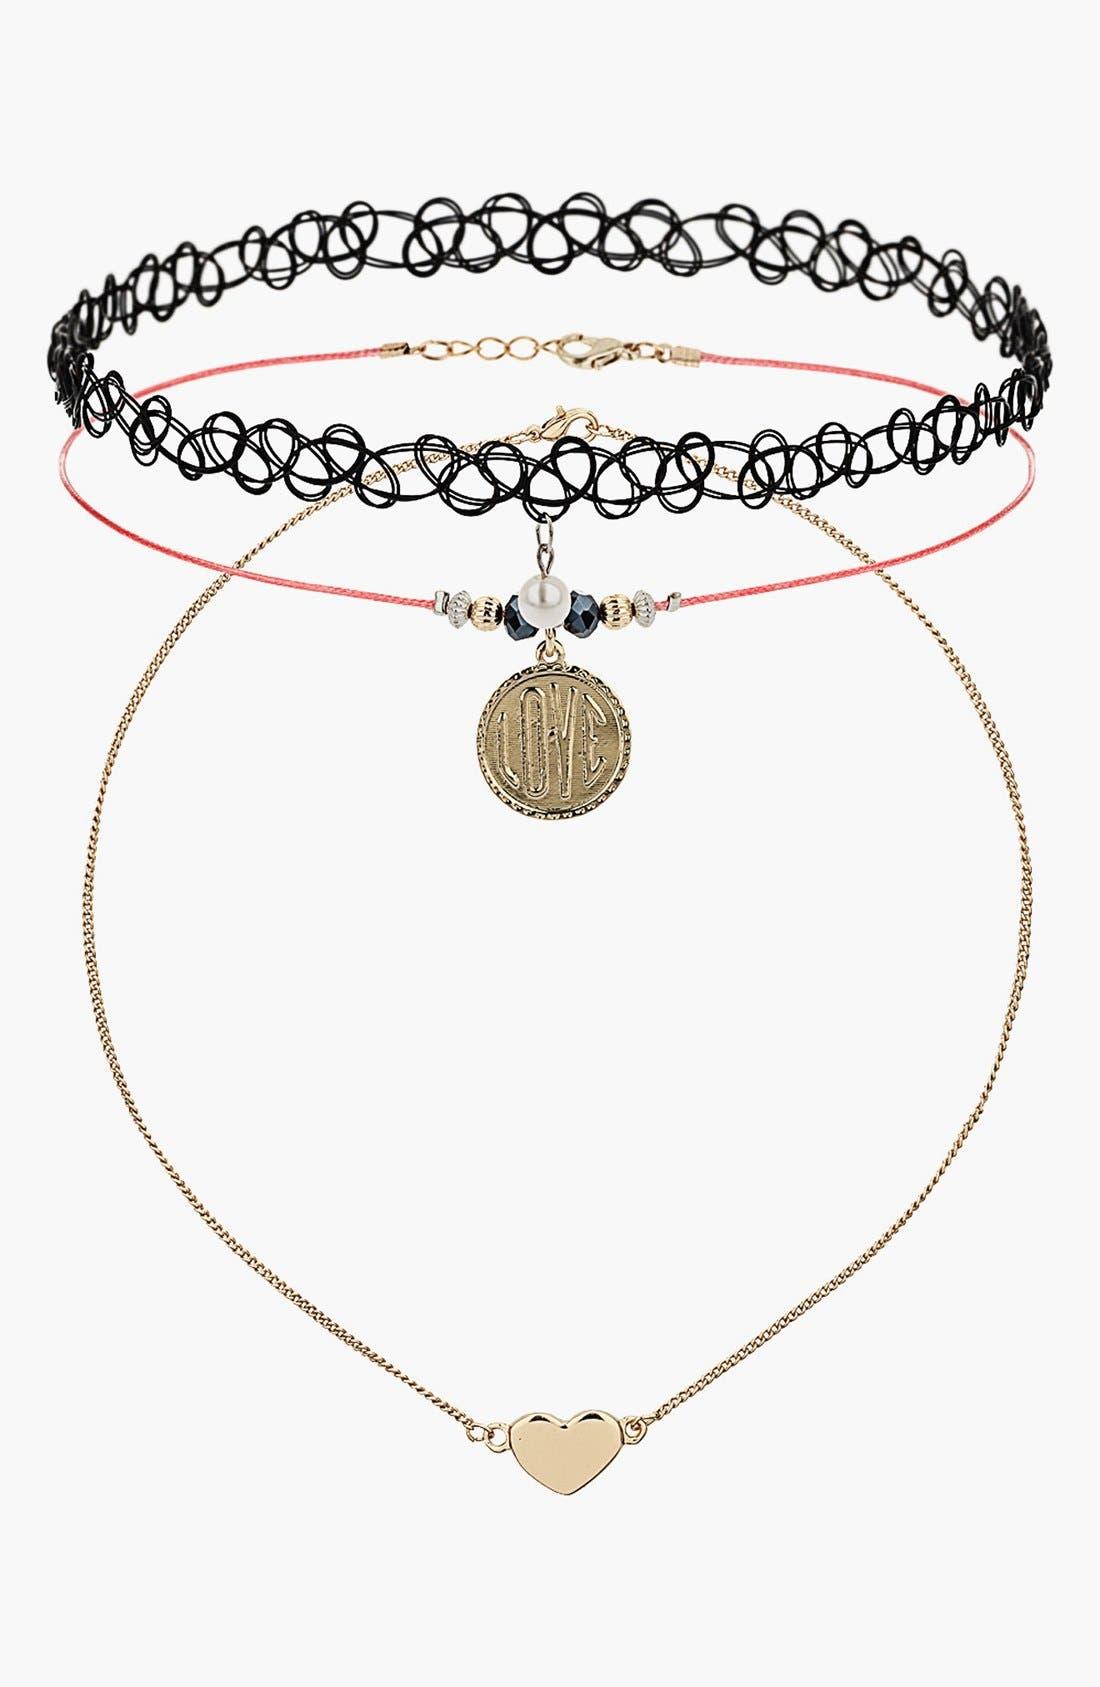 Alternate Image 1 Selected - Topshop Love Charm Choker & Necklace Set